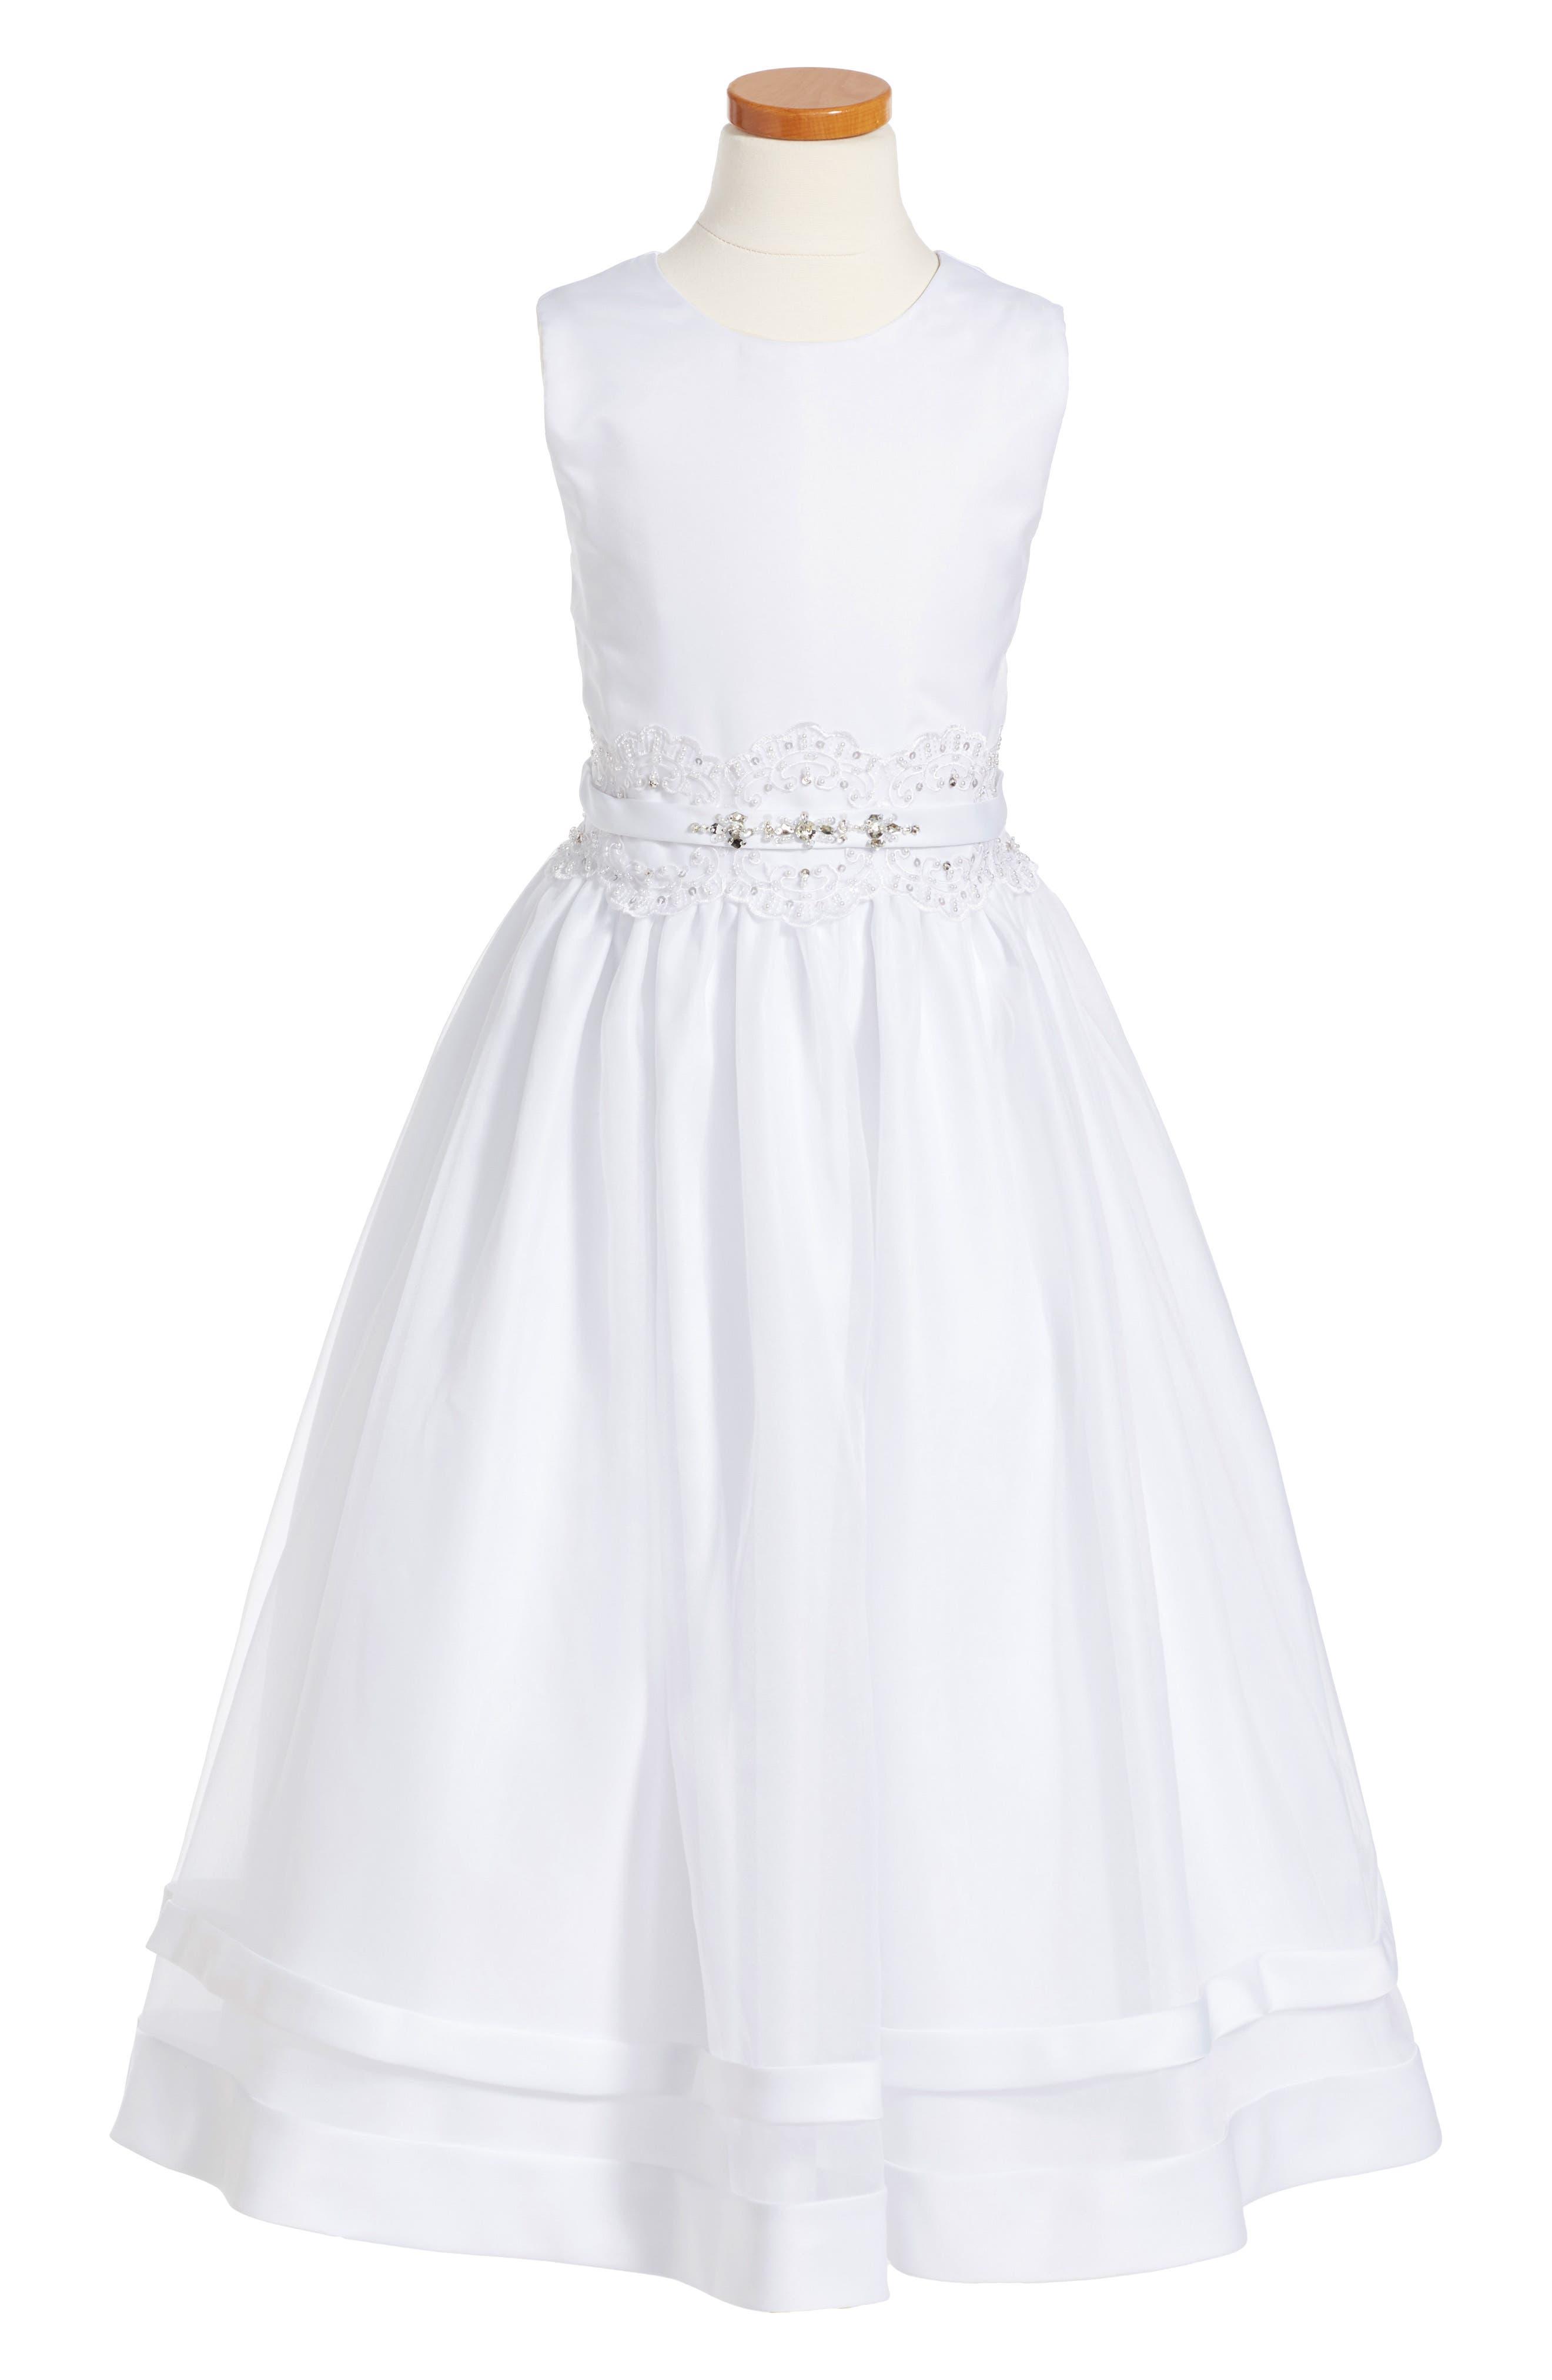 Joan Calabrese for Mon Cheri Beaded Satin & Lace First Communion Dress (Little Girls & Big Girls)